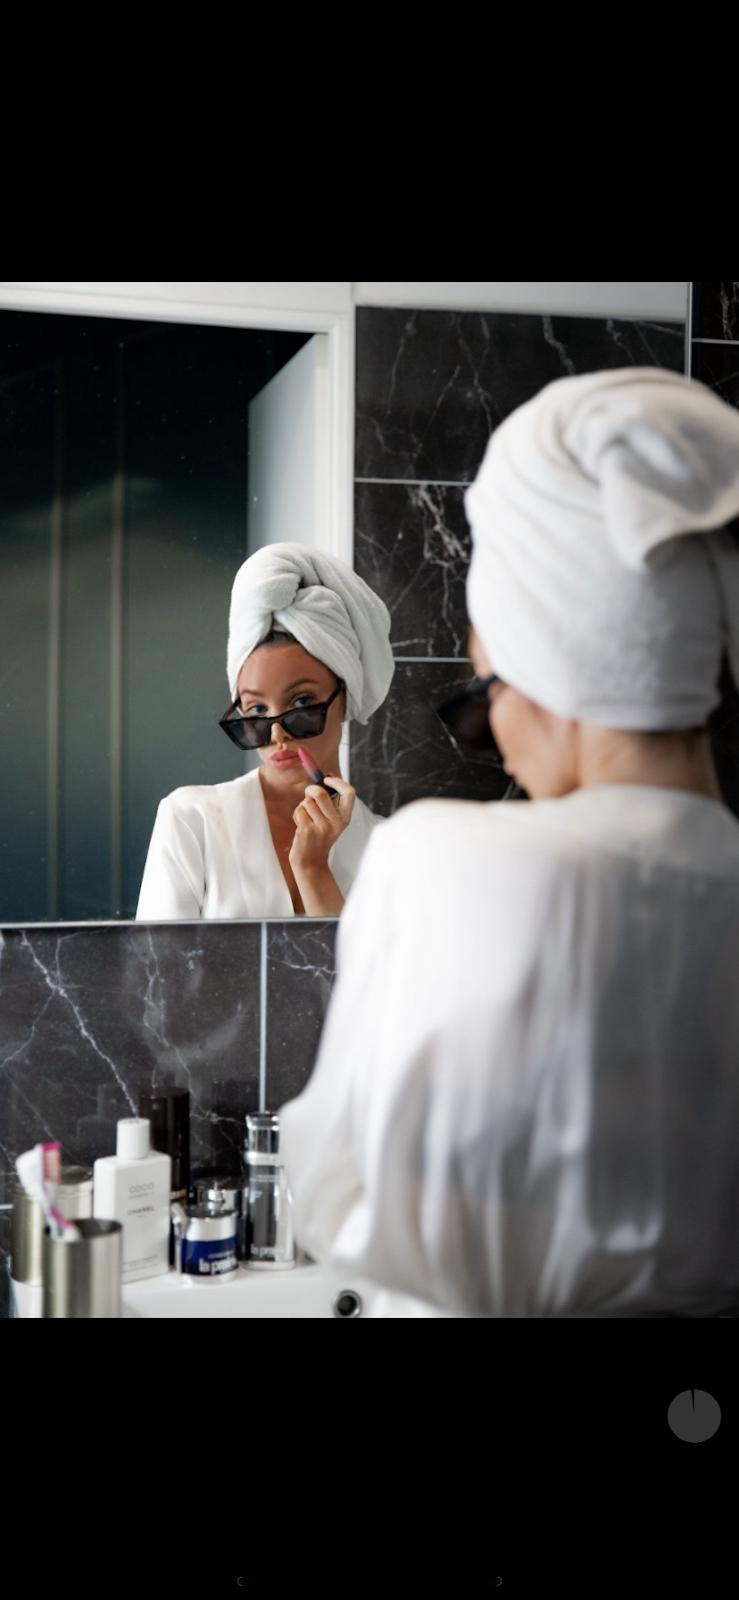 Ollia Tzarina Launched Her Own Organic Skincare Brand